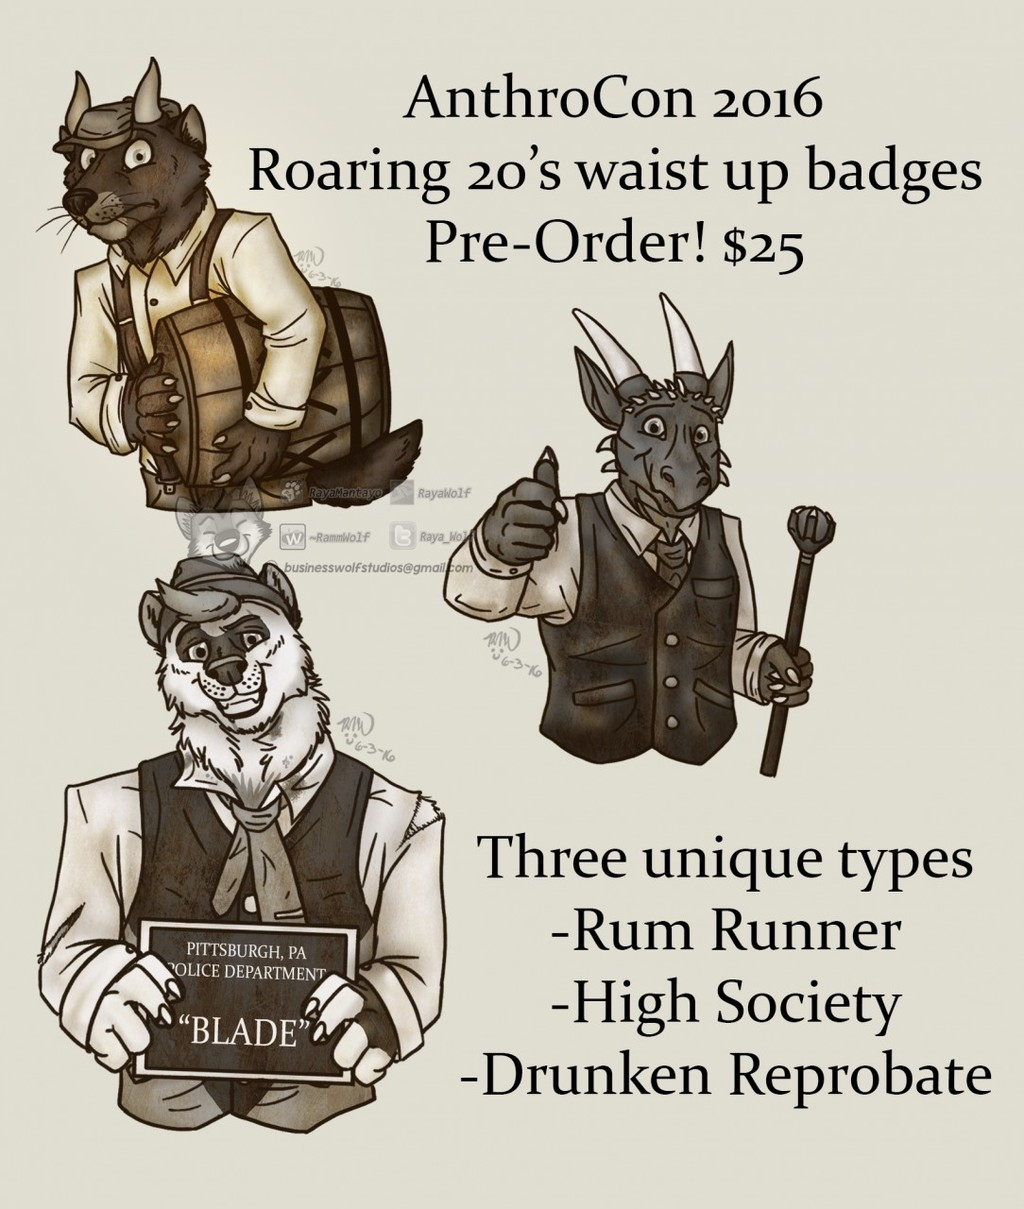 AnthroCon 20's Badges!